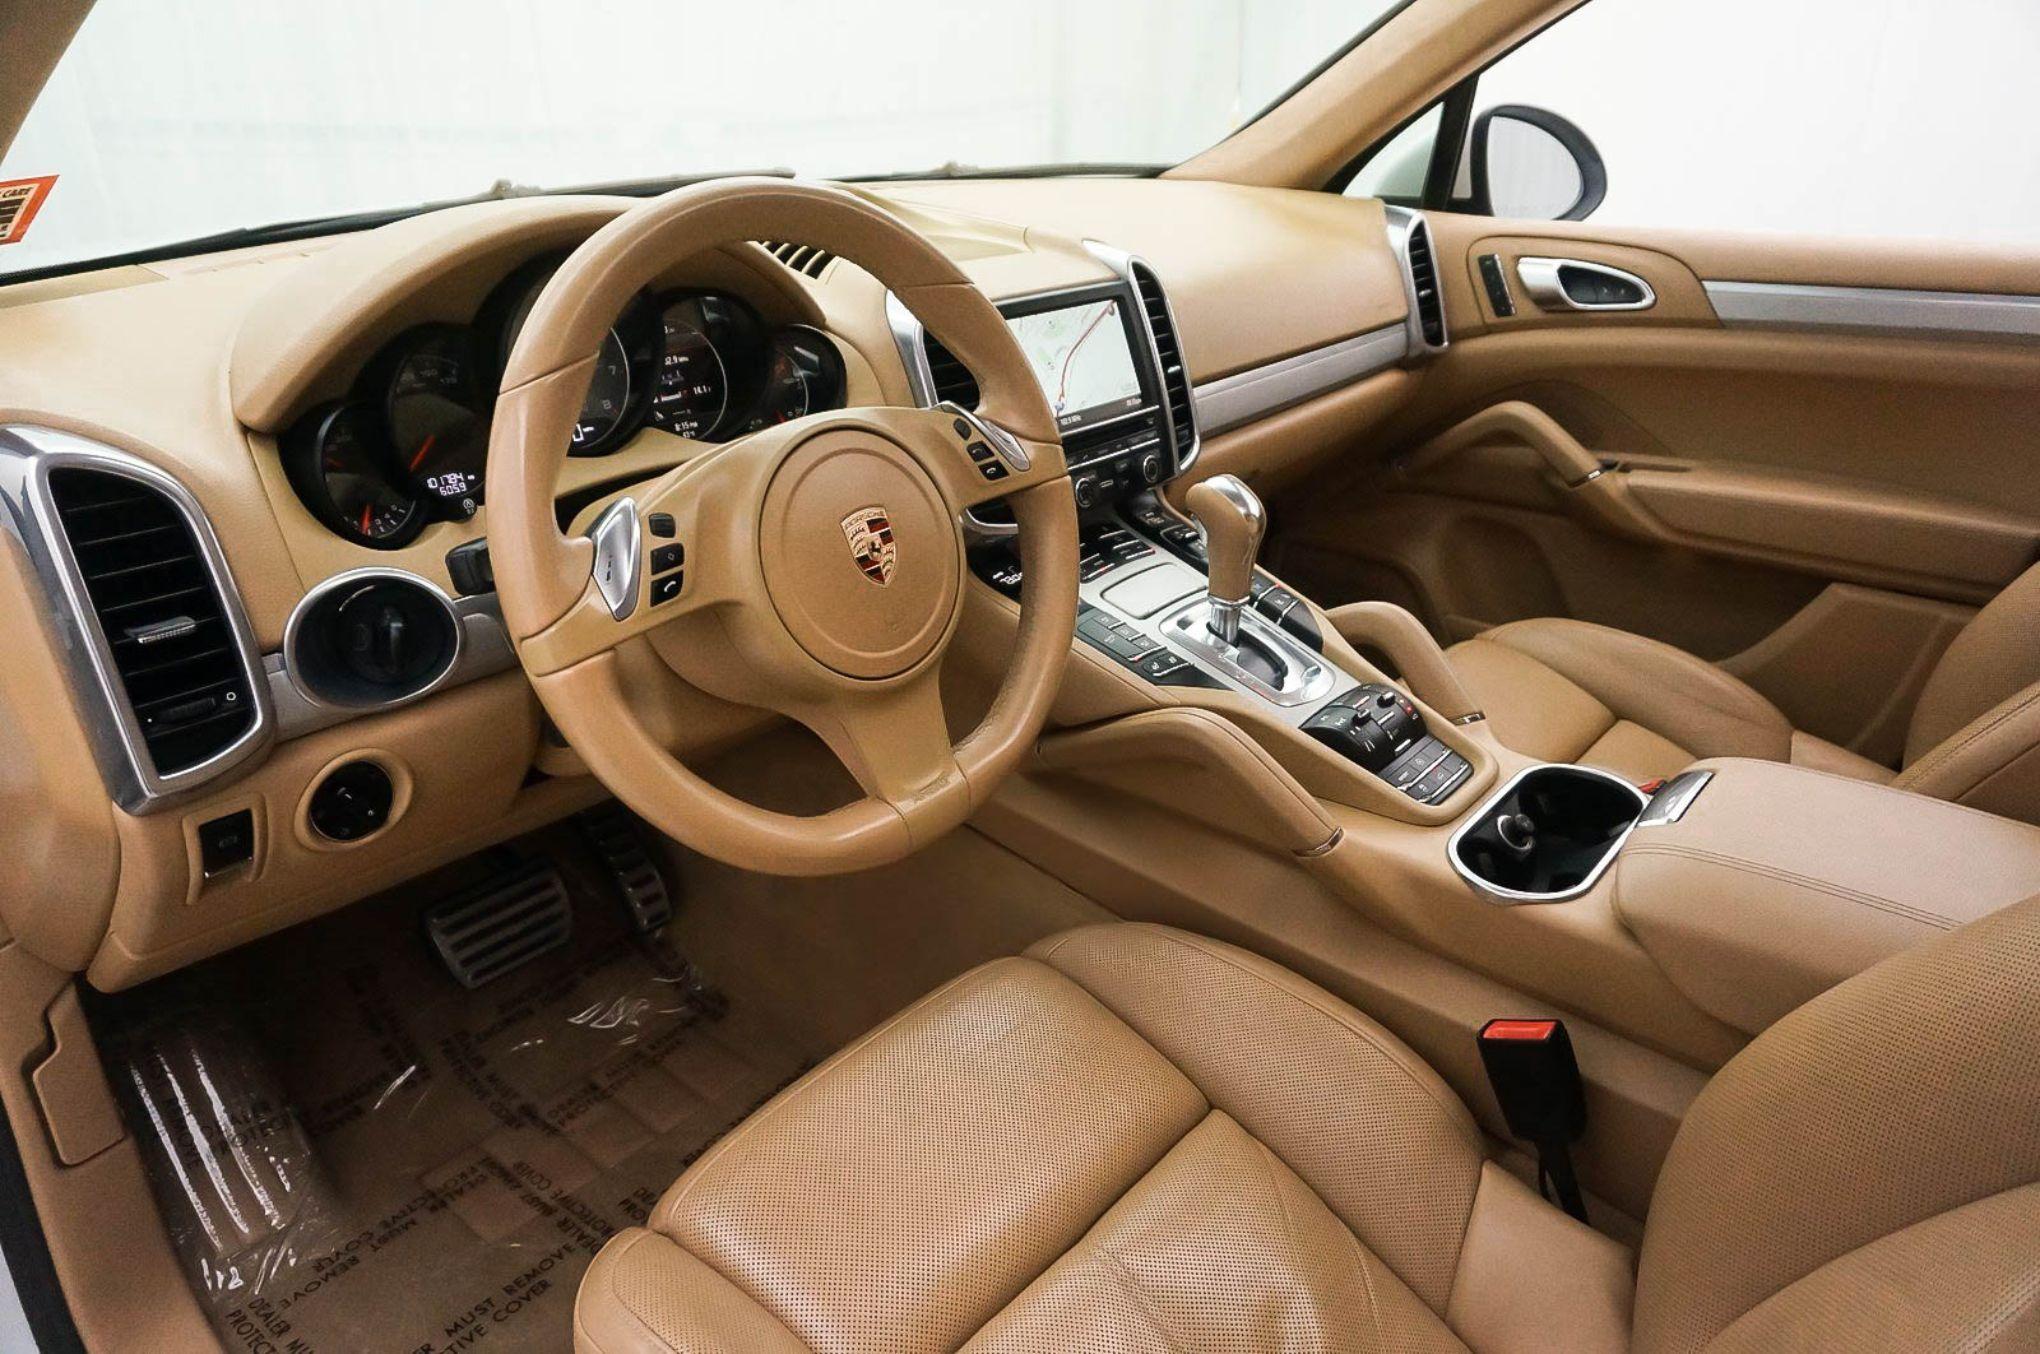 2013 Porsche Cayenne Gts Pcarmarket